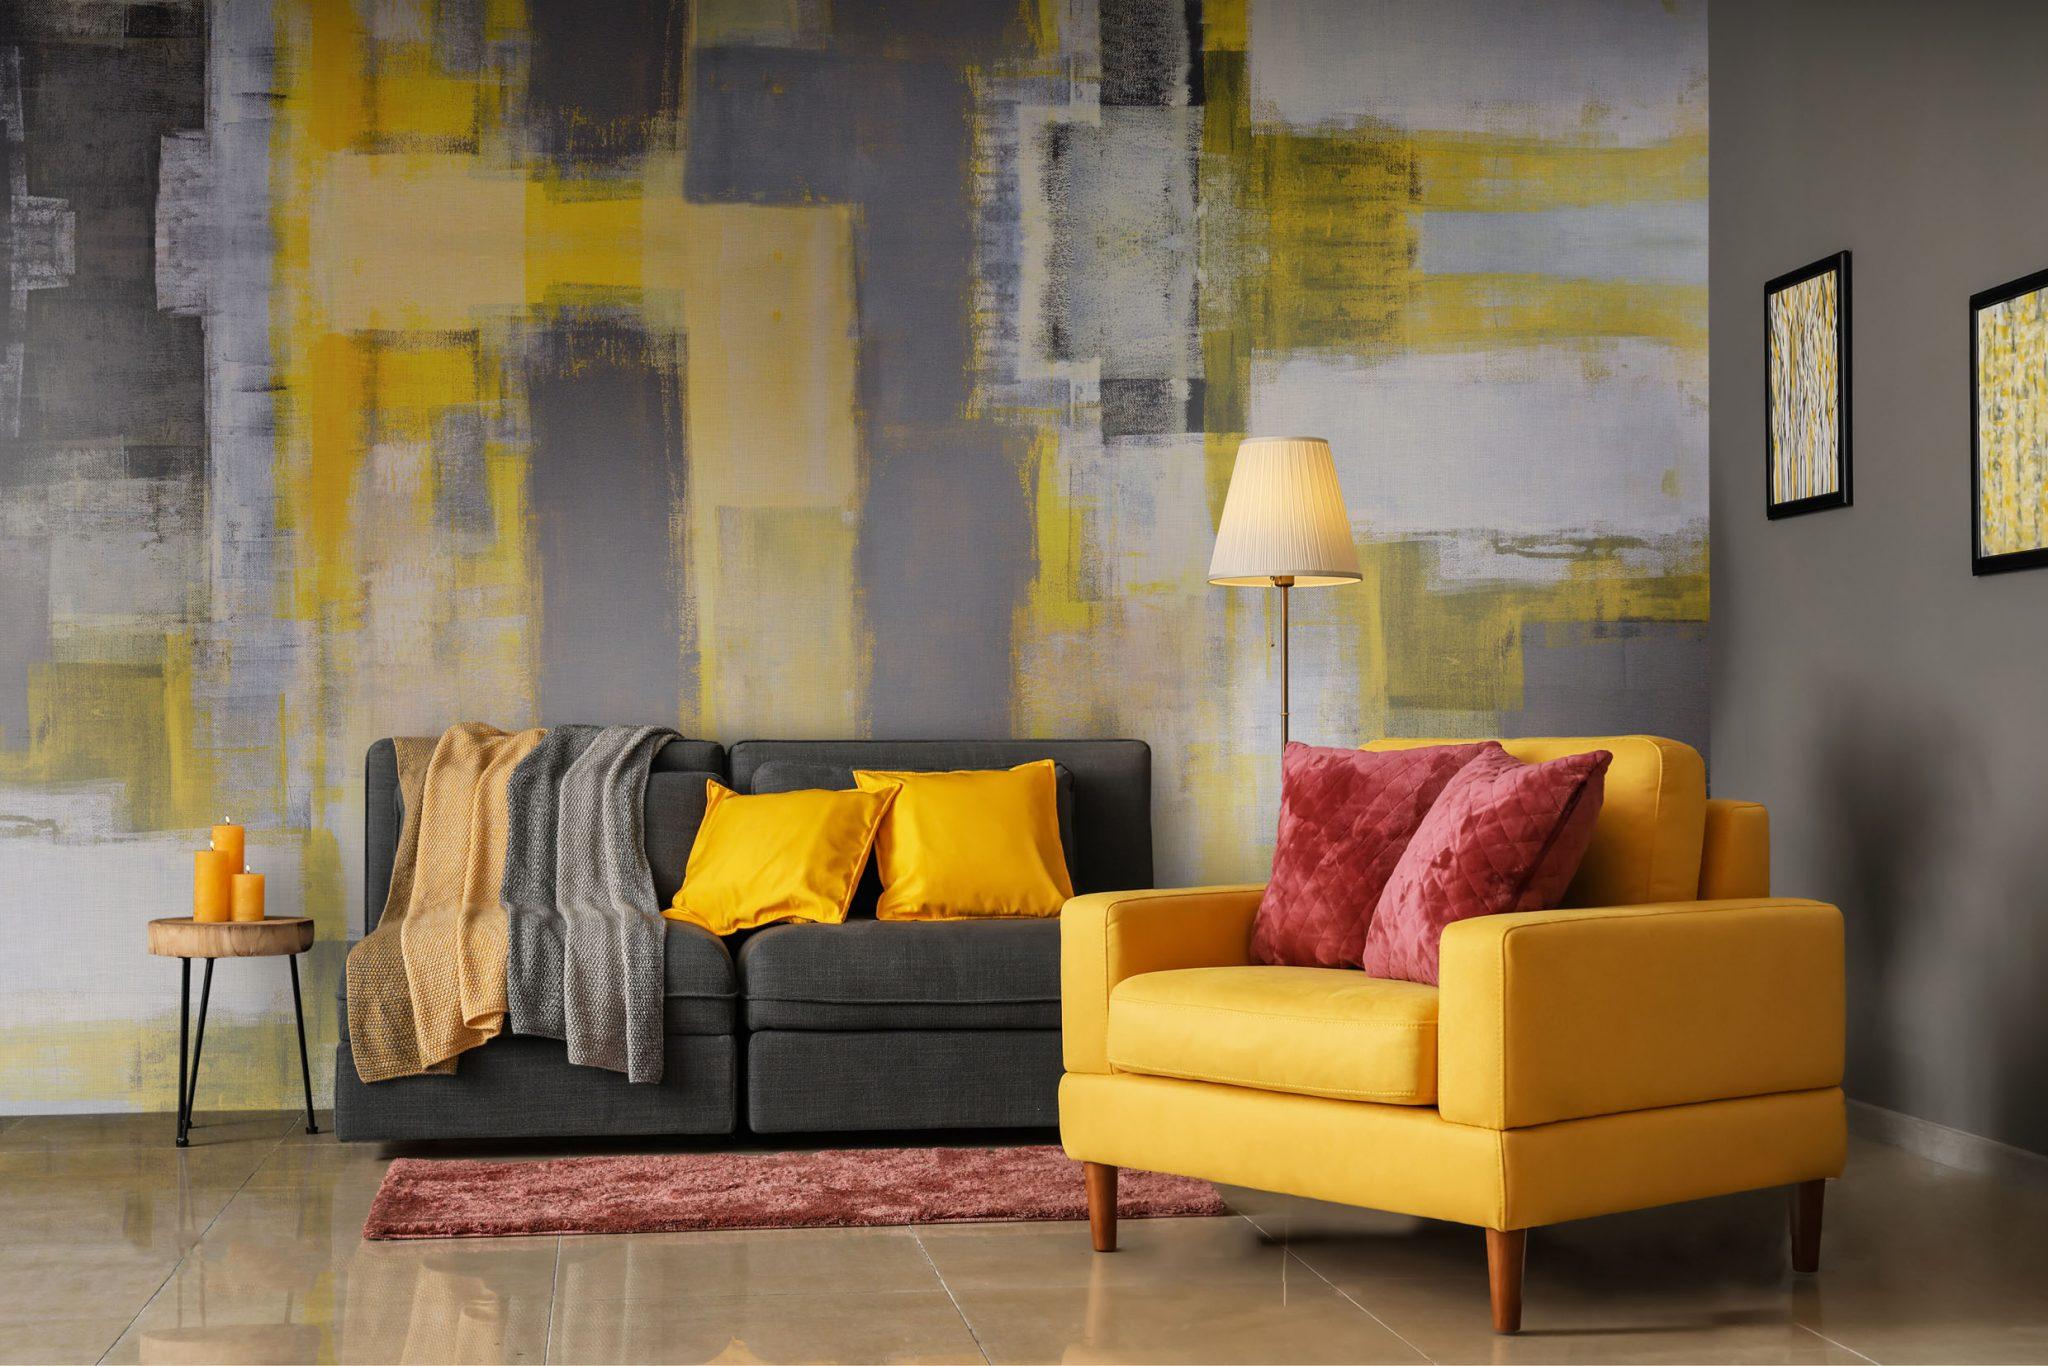 Introducing Avery Dennison Wallpaper